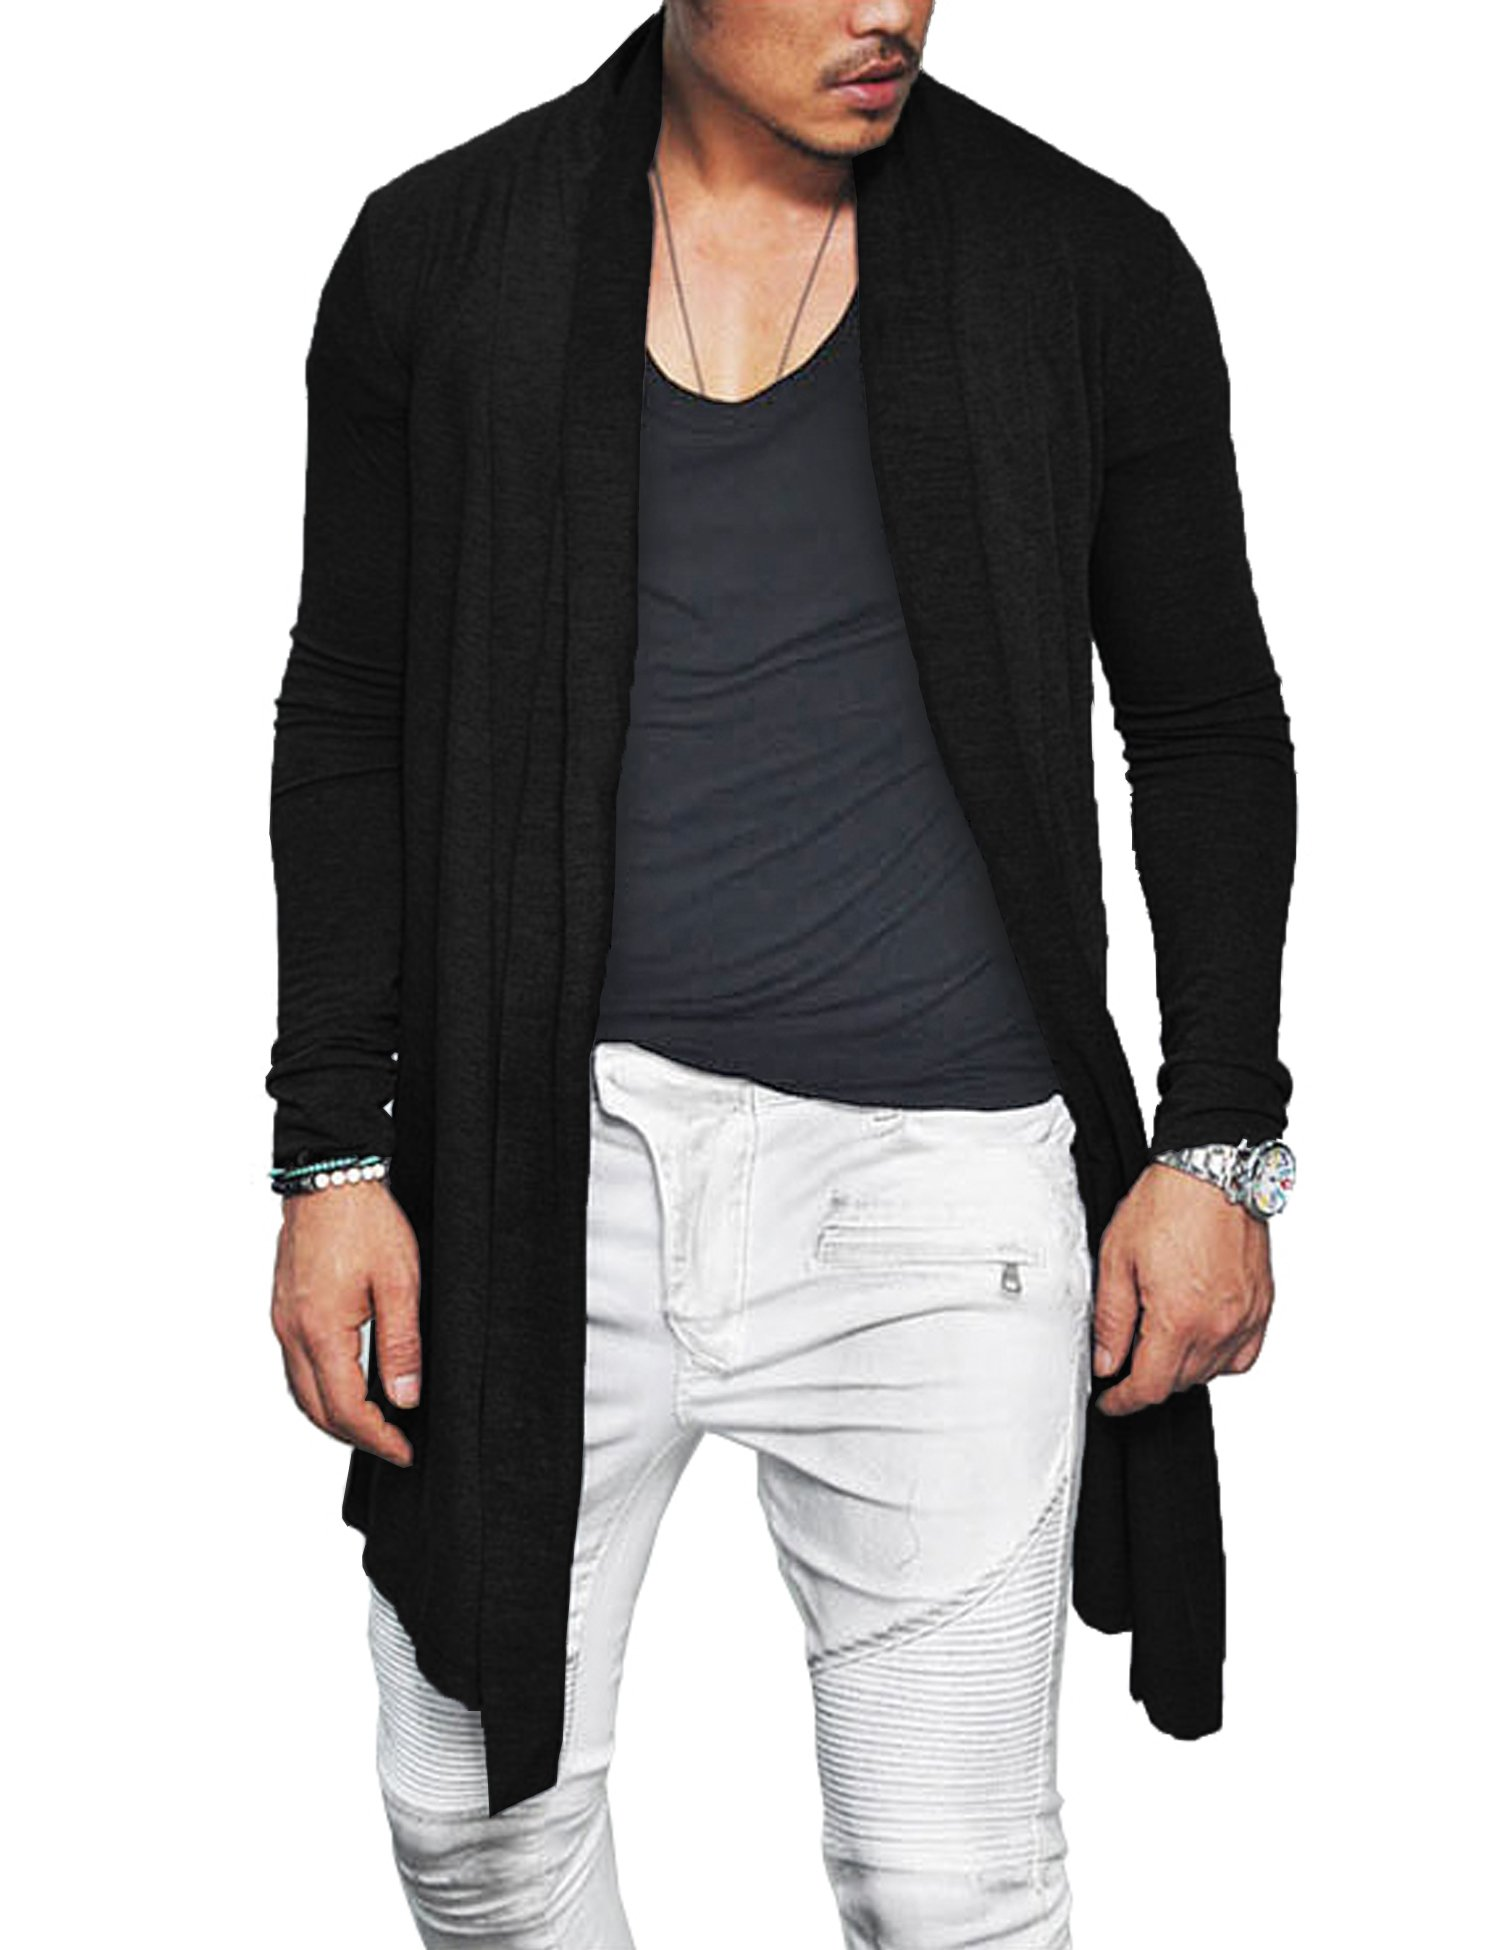 COOFANDY Men's Ruffle Shawl Collar Long Sleeves Cardigan (Medium, Black) by COOFANDY (Image #1)